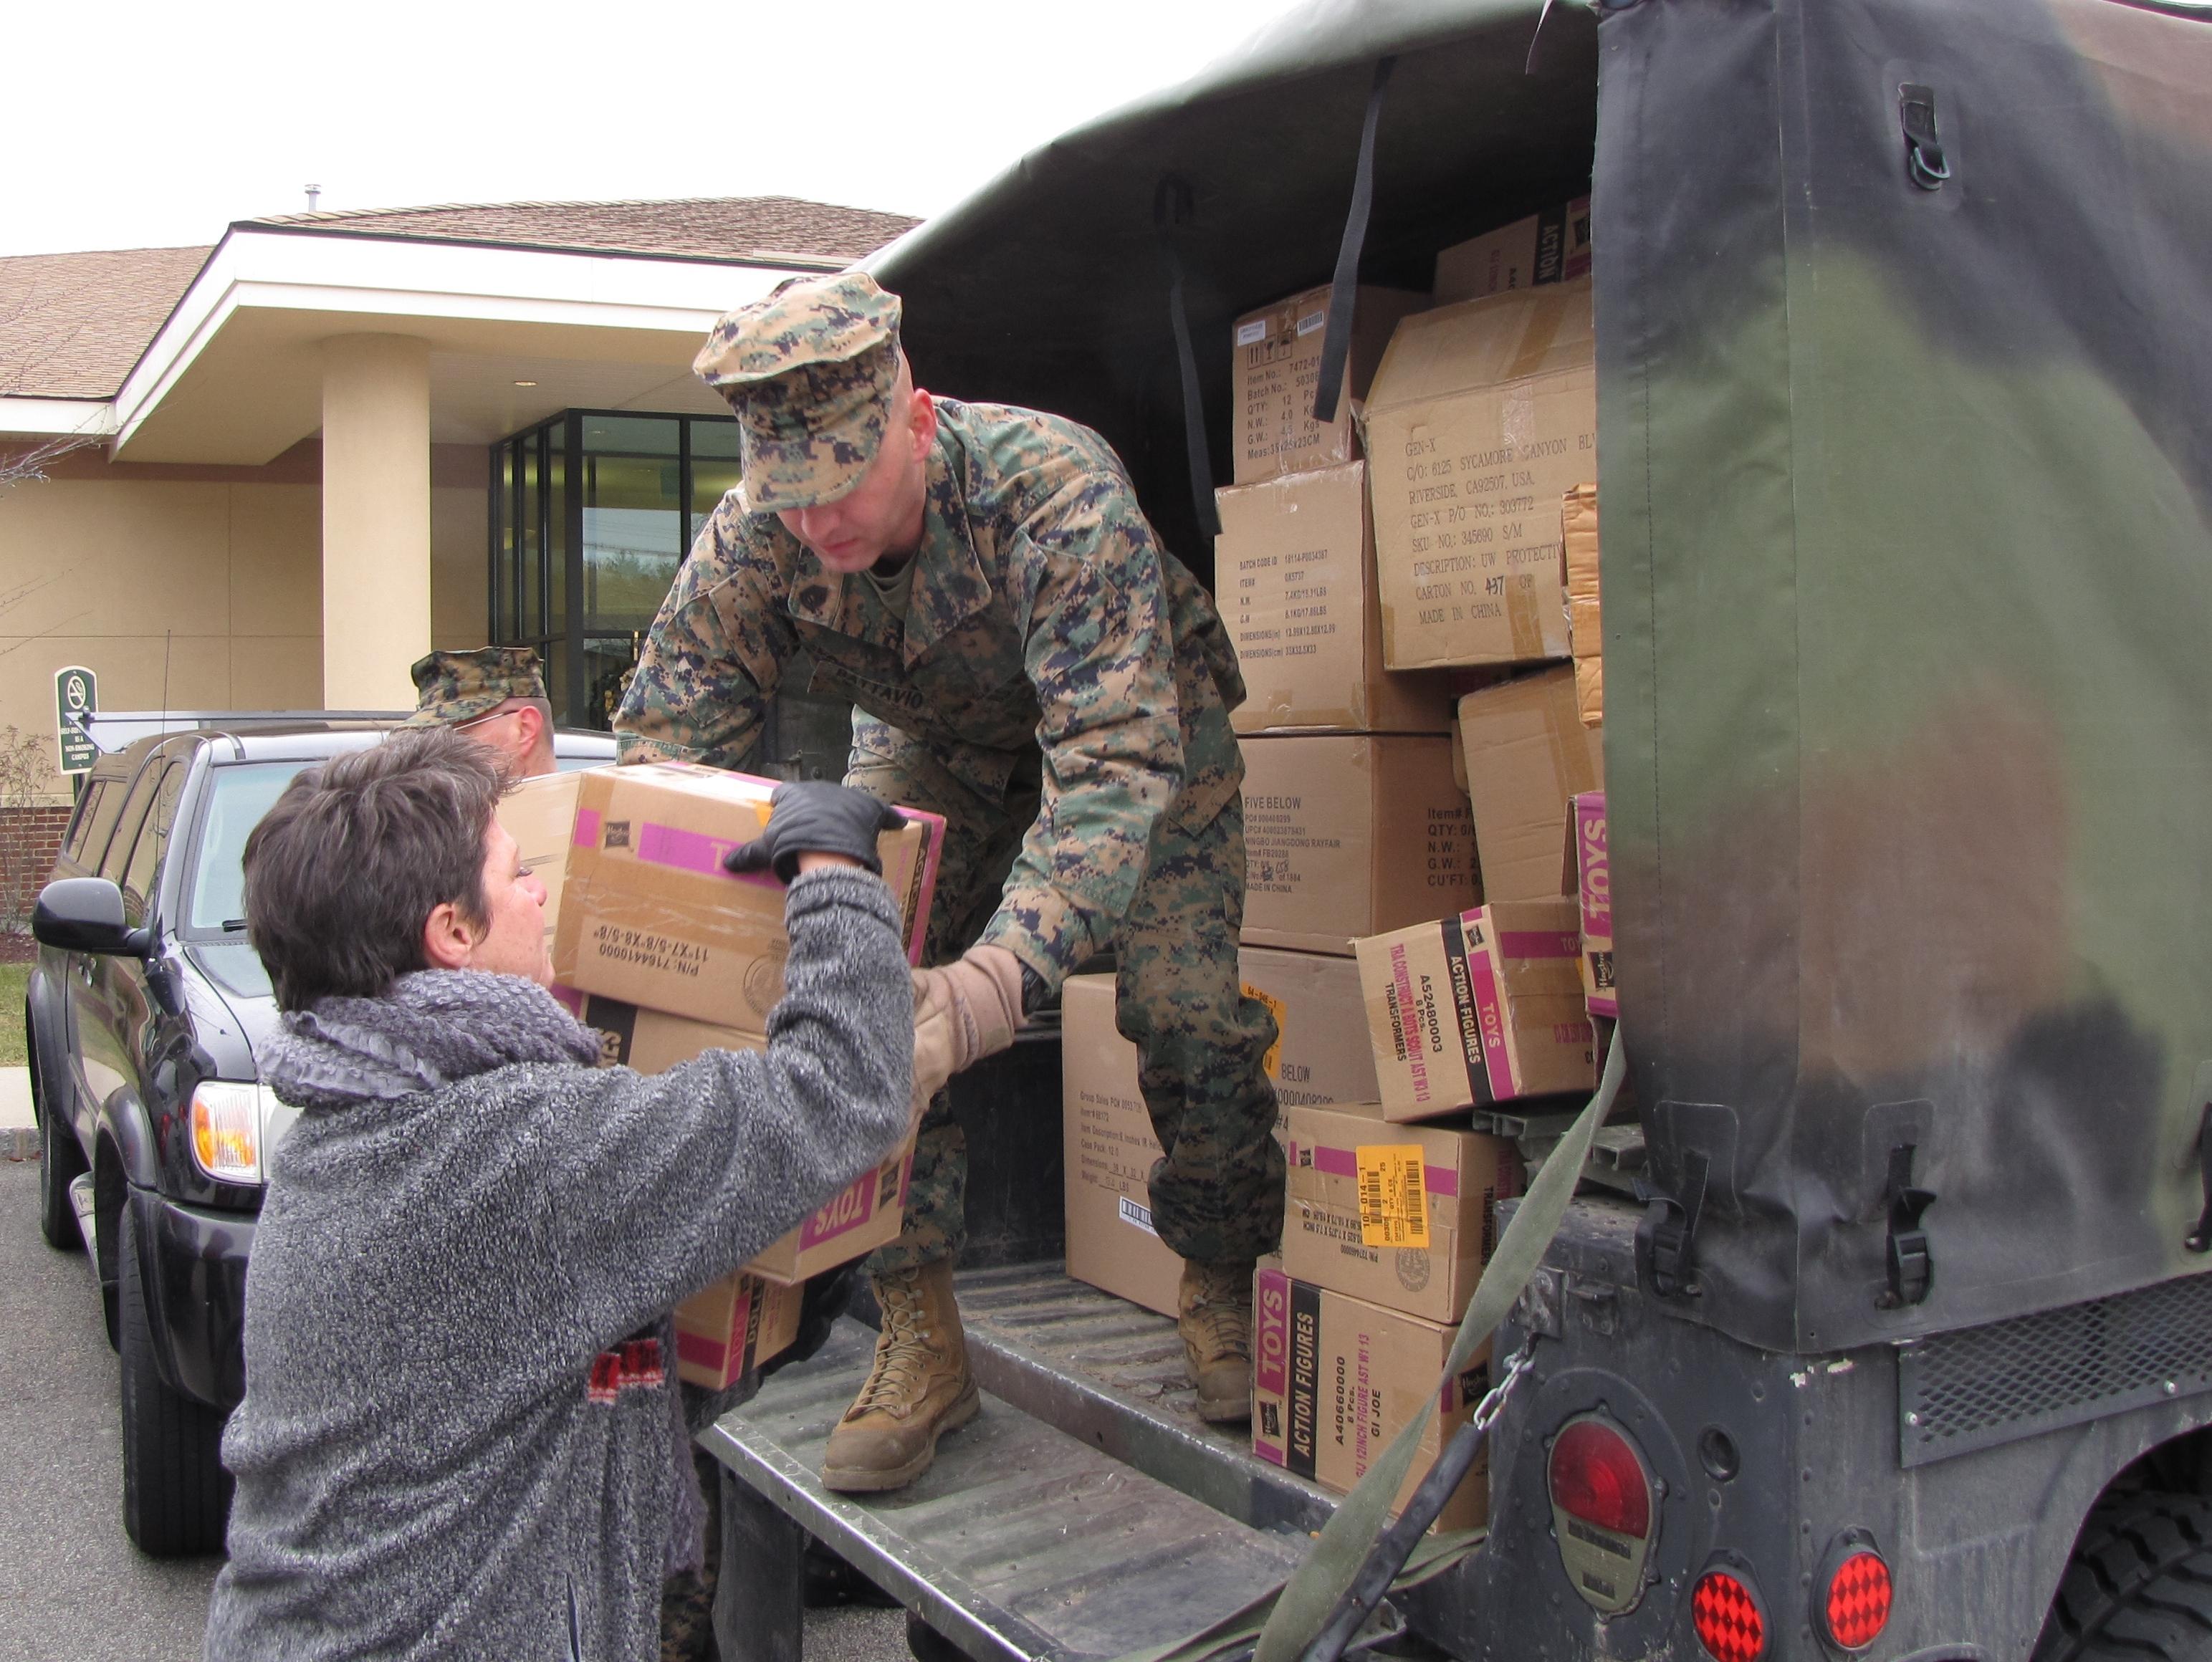 8b00e2a8723e60533960_Beverly_Gordon_receives_toys_from_Gunnery_Sergeant_Kevin_Battavio.JPG